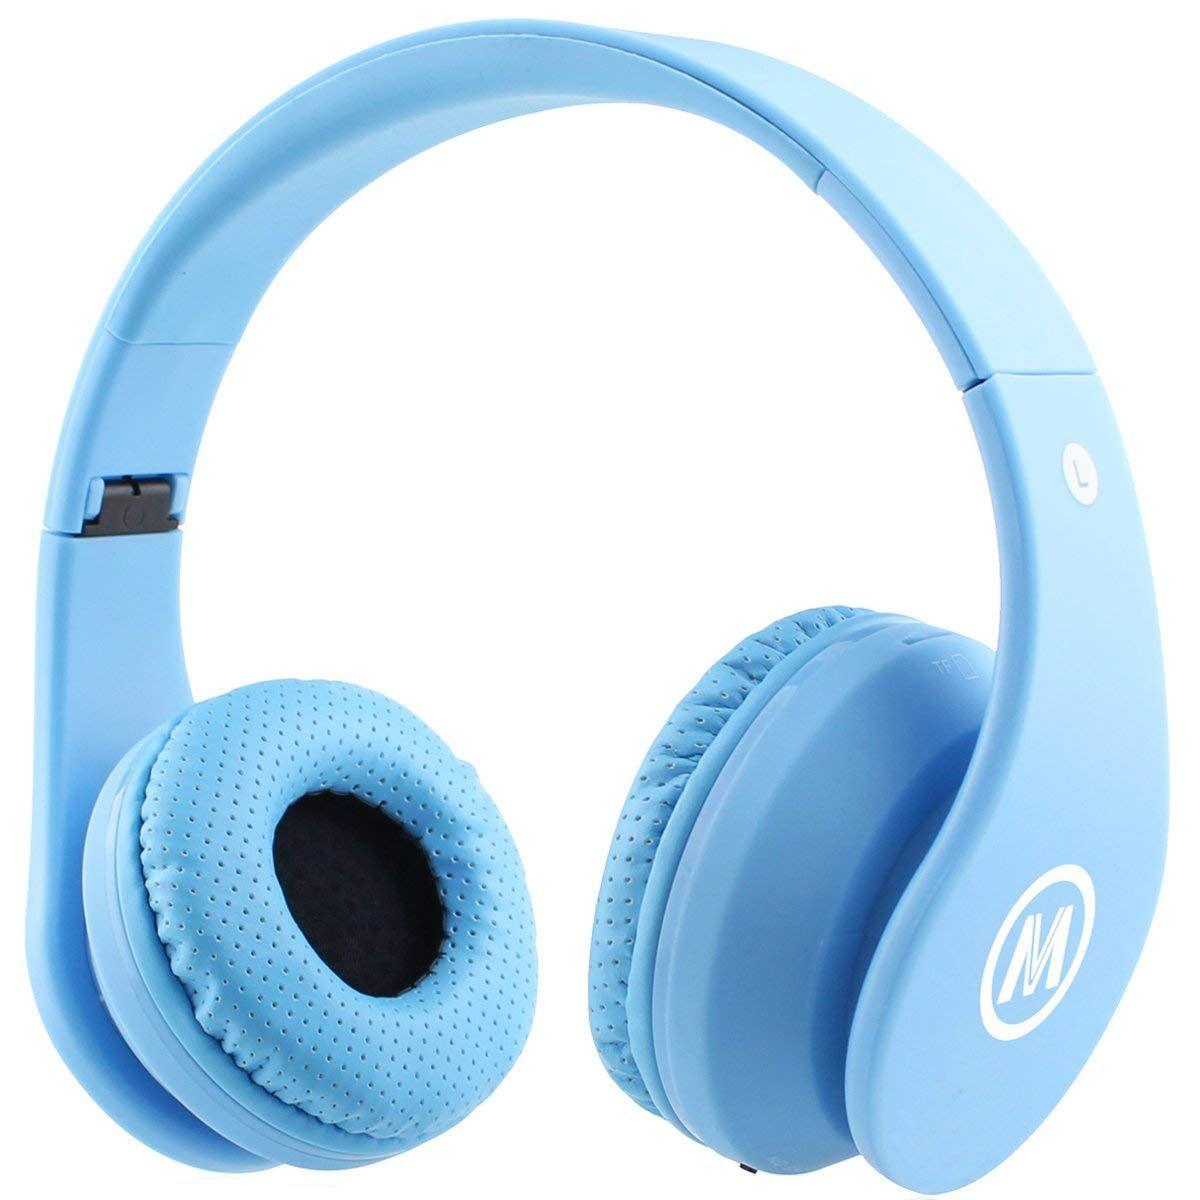 Amazon Com Mokata Kids Headphone Bluetooth Wireless Over Ear Foldable Rechargeable Stereo Sound Headset With Au Kids Headphones Bluetooth Headphones Headphone